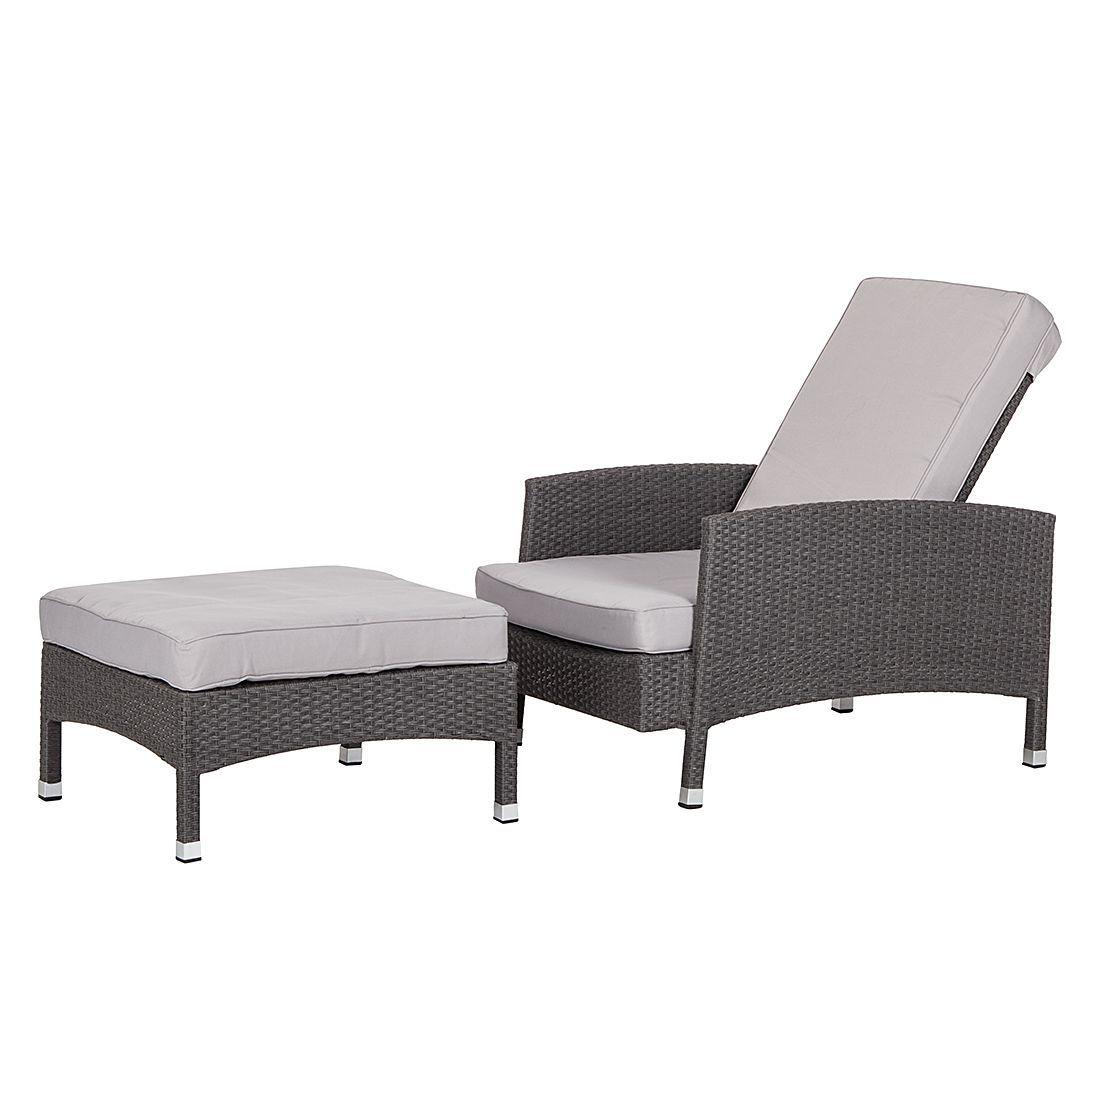 sessel set paradise lounge mit hocker polyrattan grau. Black Bedroom Furniture Sets. Home Design Ideas